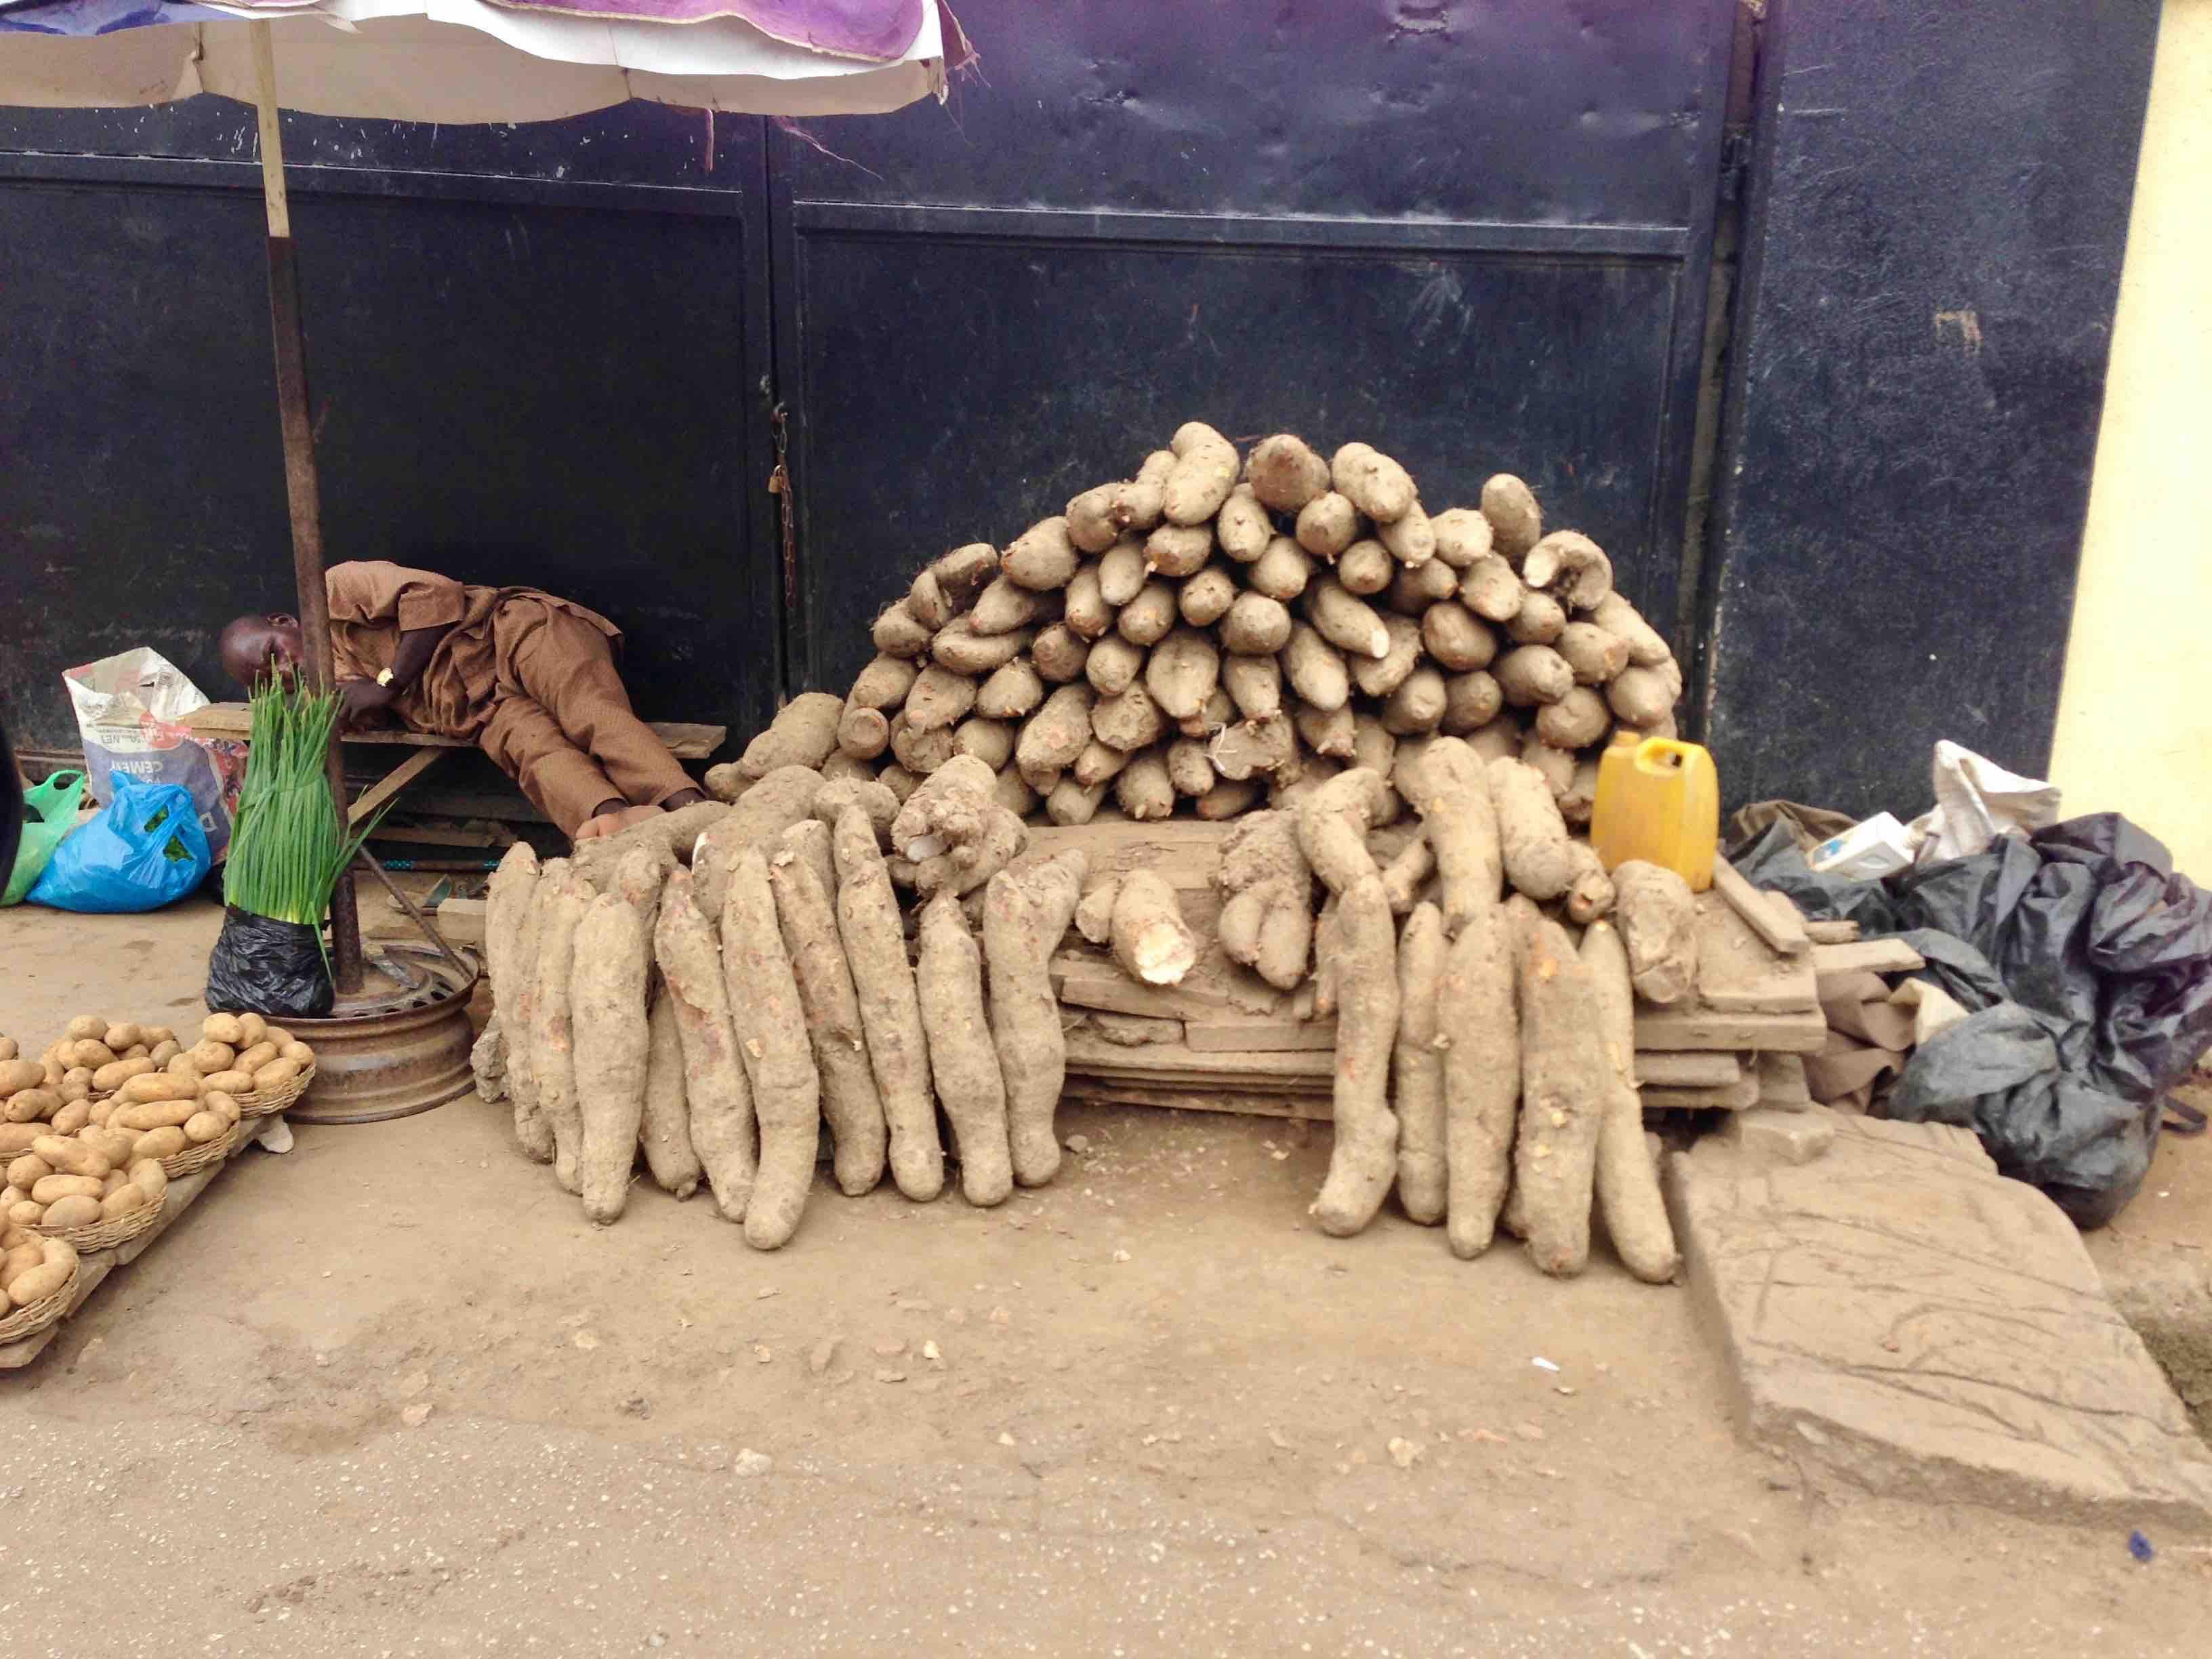 African yams, roadside market, Sunmola Street, Maryland, Lagos State, Nigeria. #JujuFilms